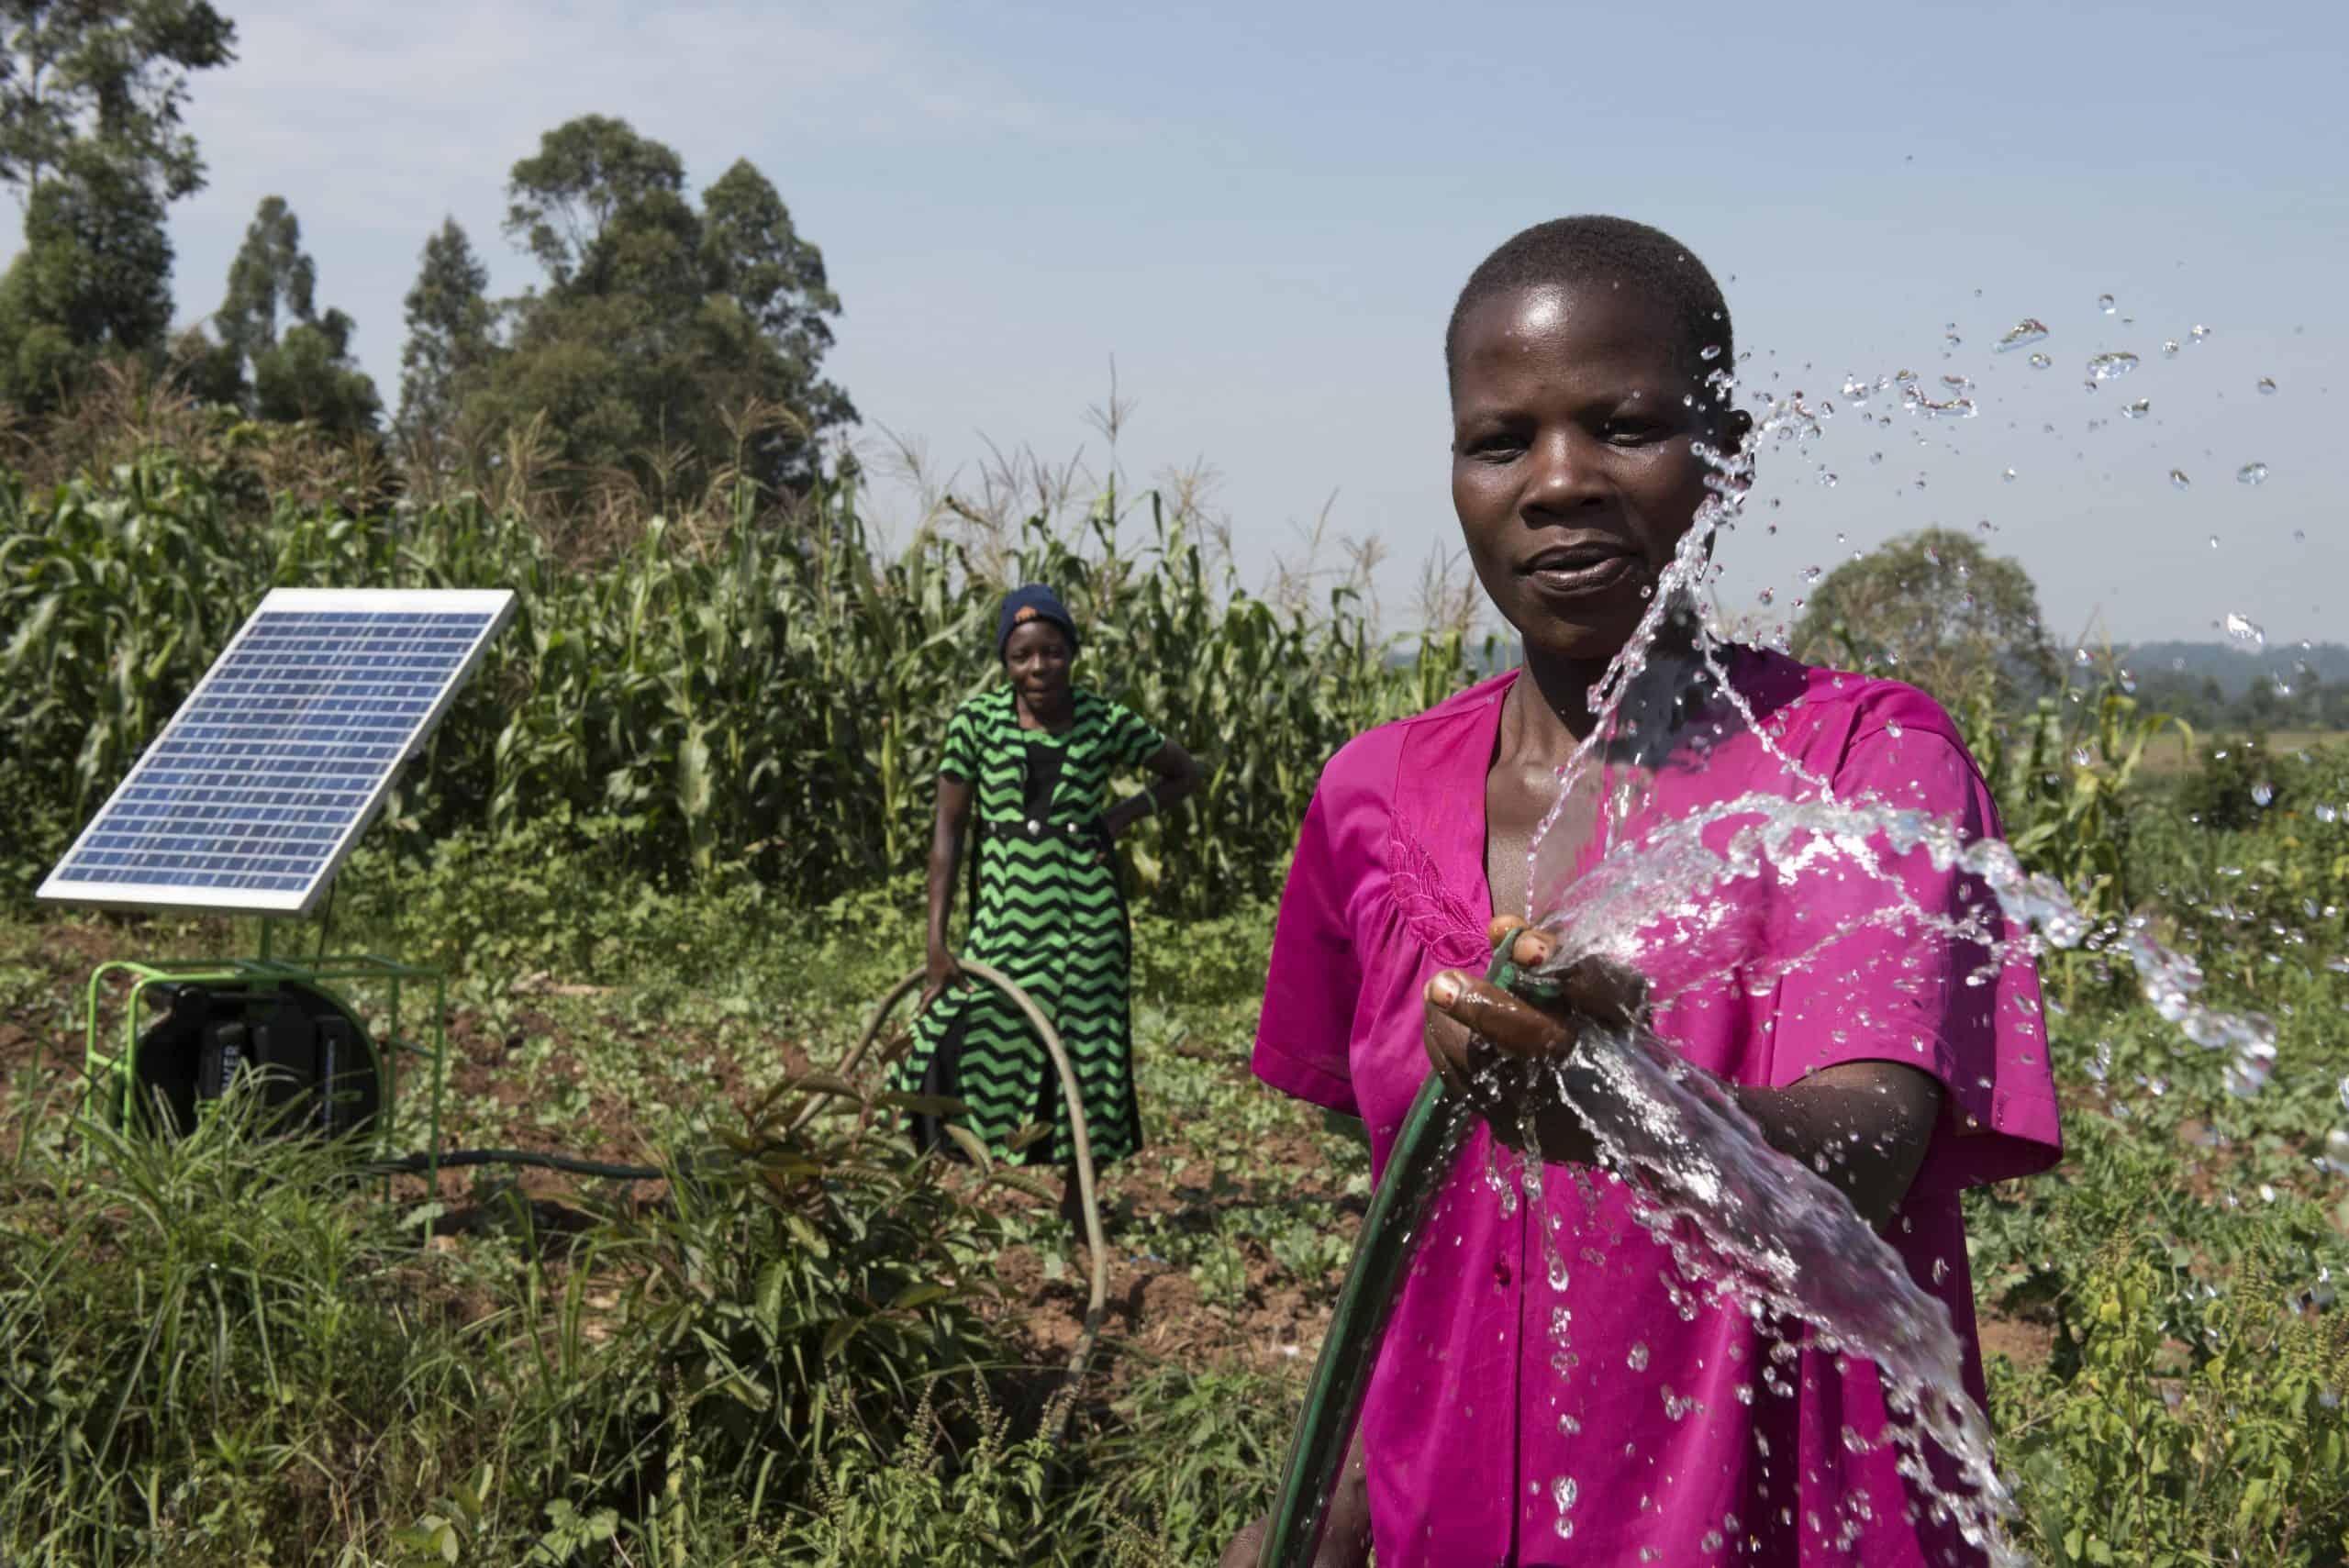 A woman sprays a hose in a field